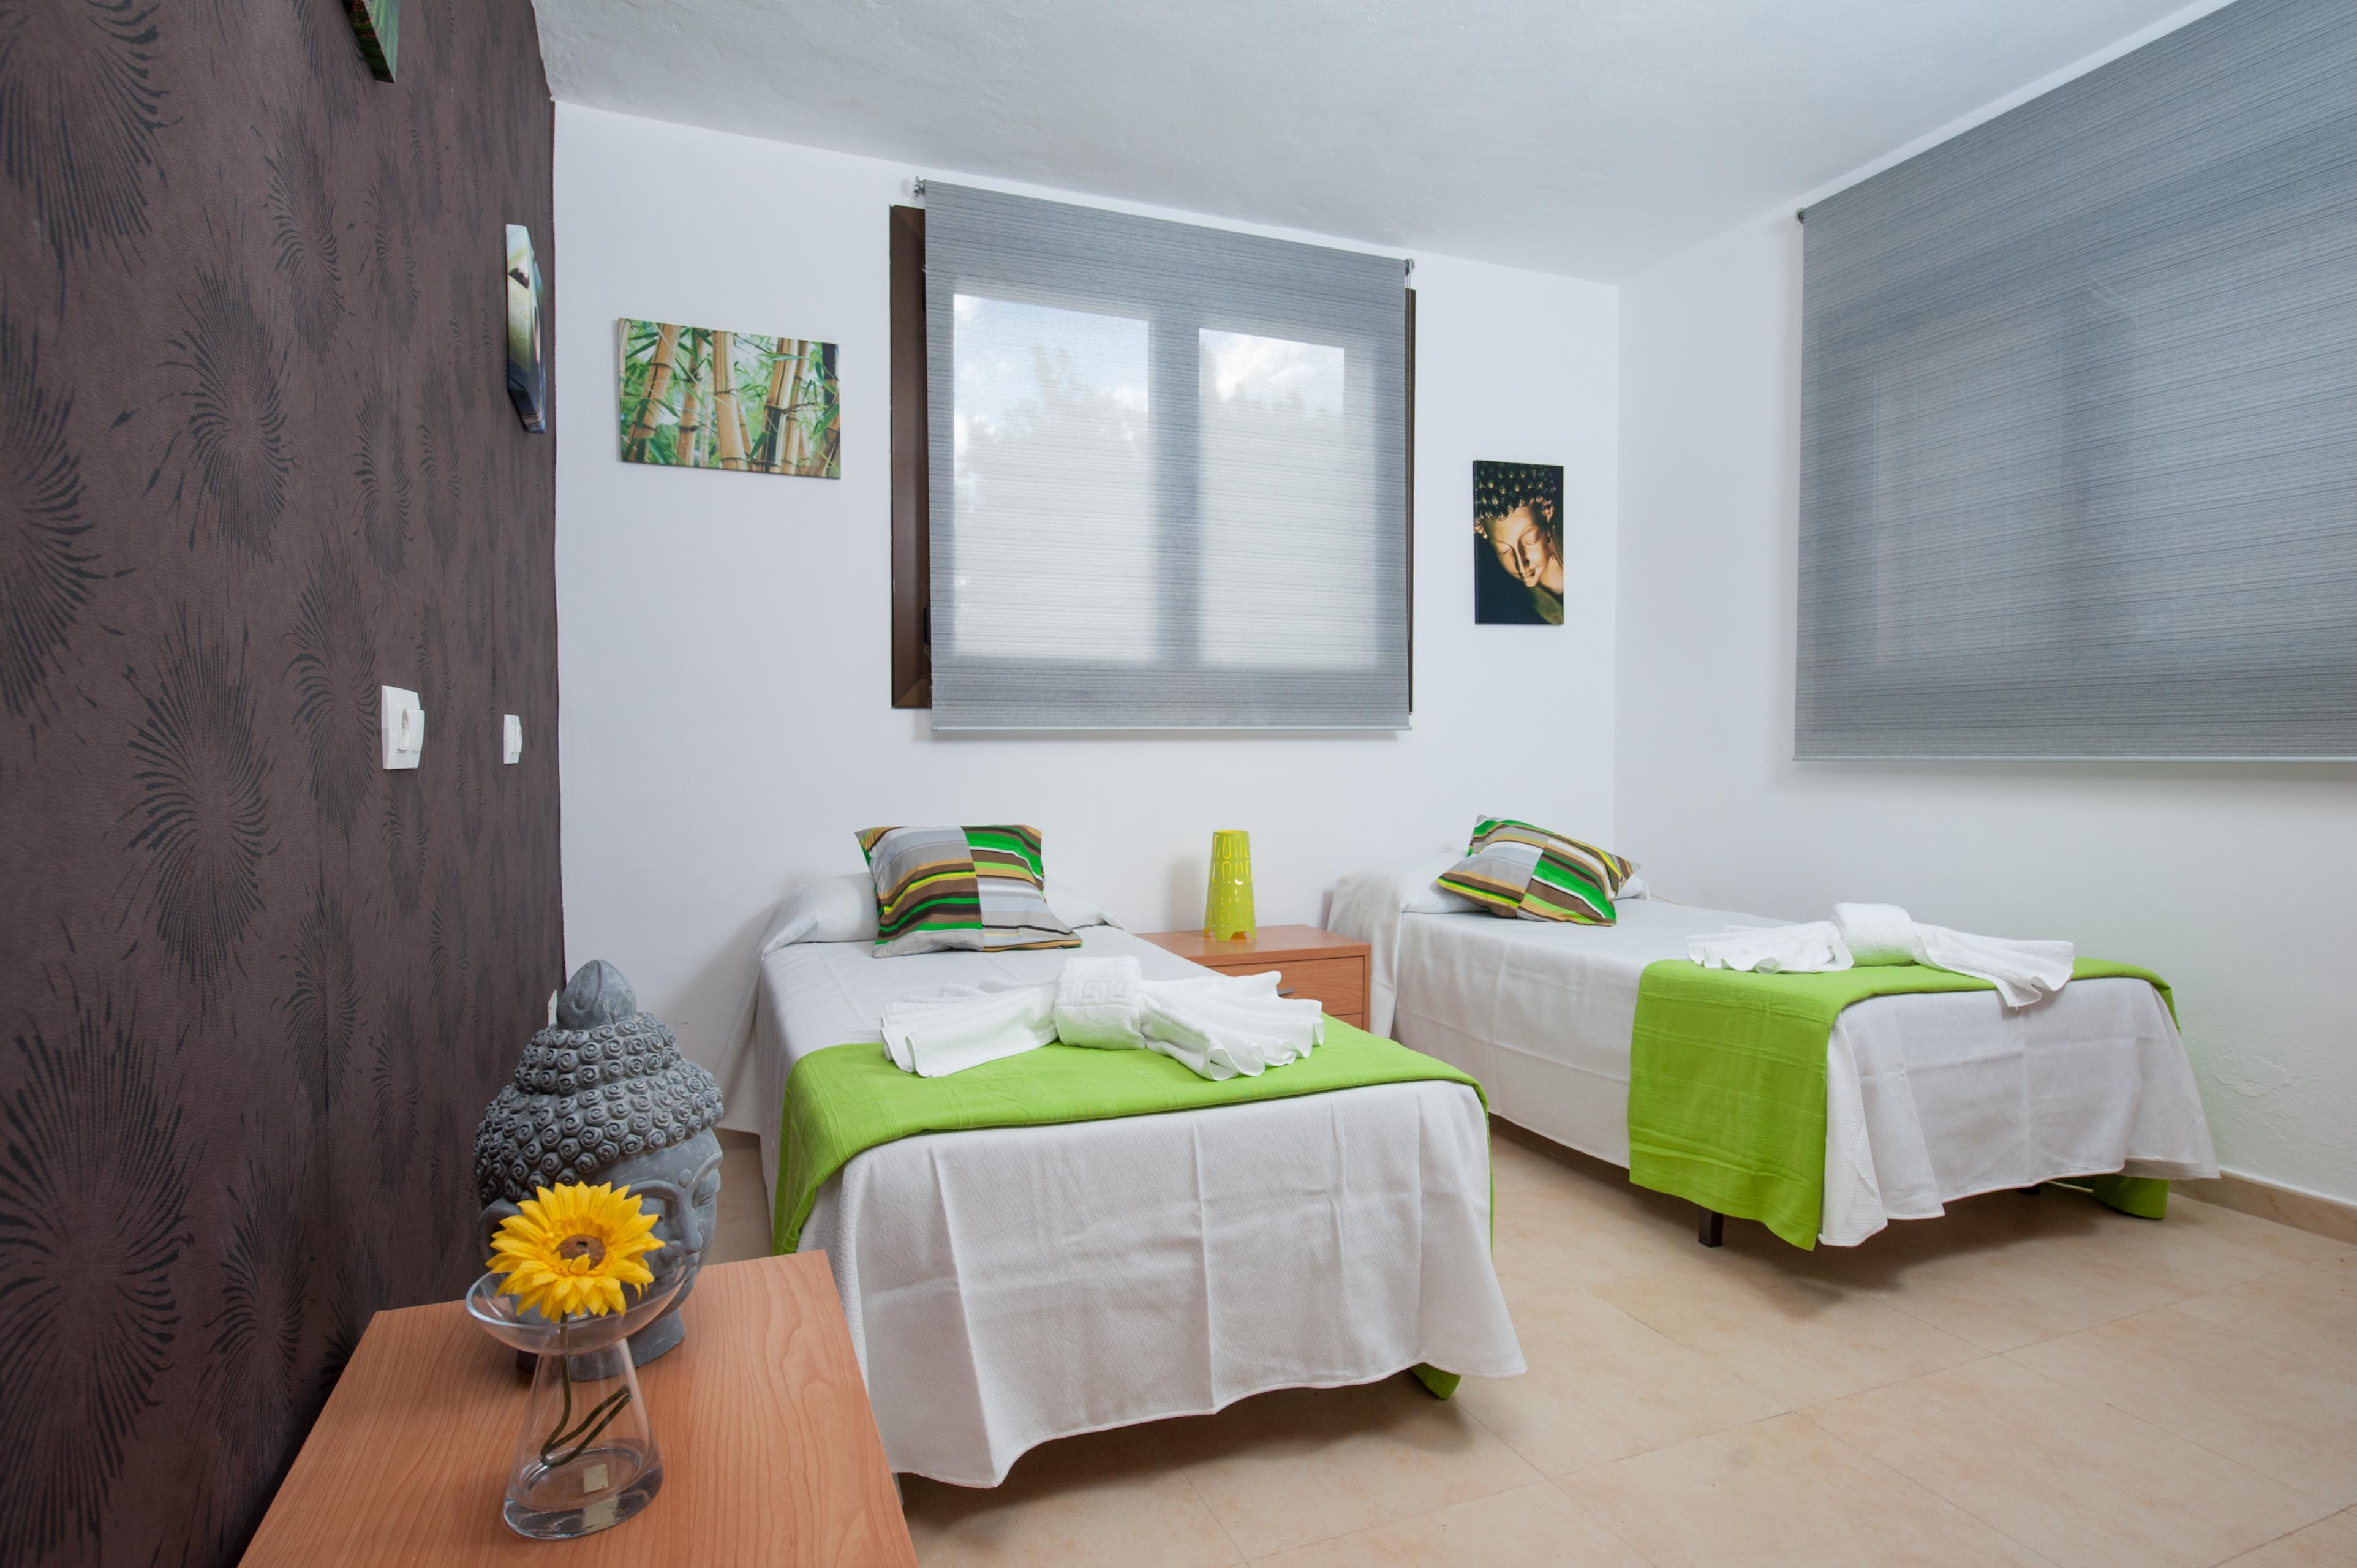 Maison de vacances CA'N LLUC- Alaró- MALLORCA - Kostenloses WLAN (2687507), Alaro, Majorque, Iles Baléares, Espagne, image 32